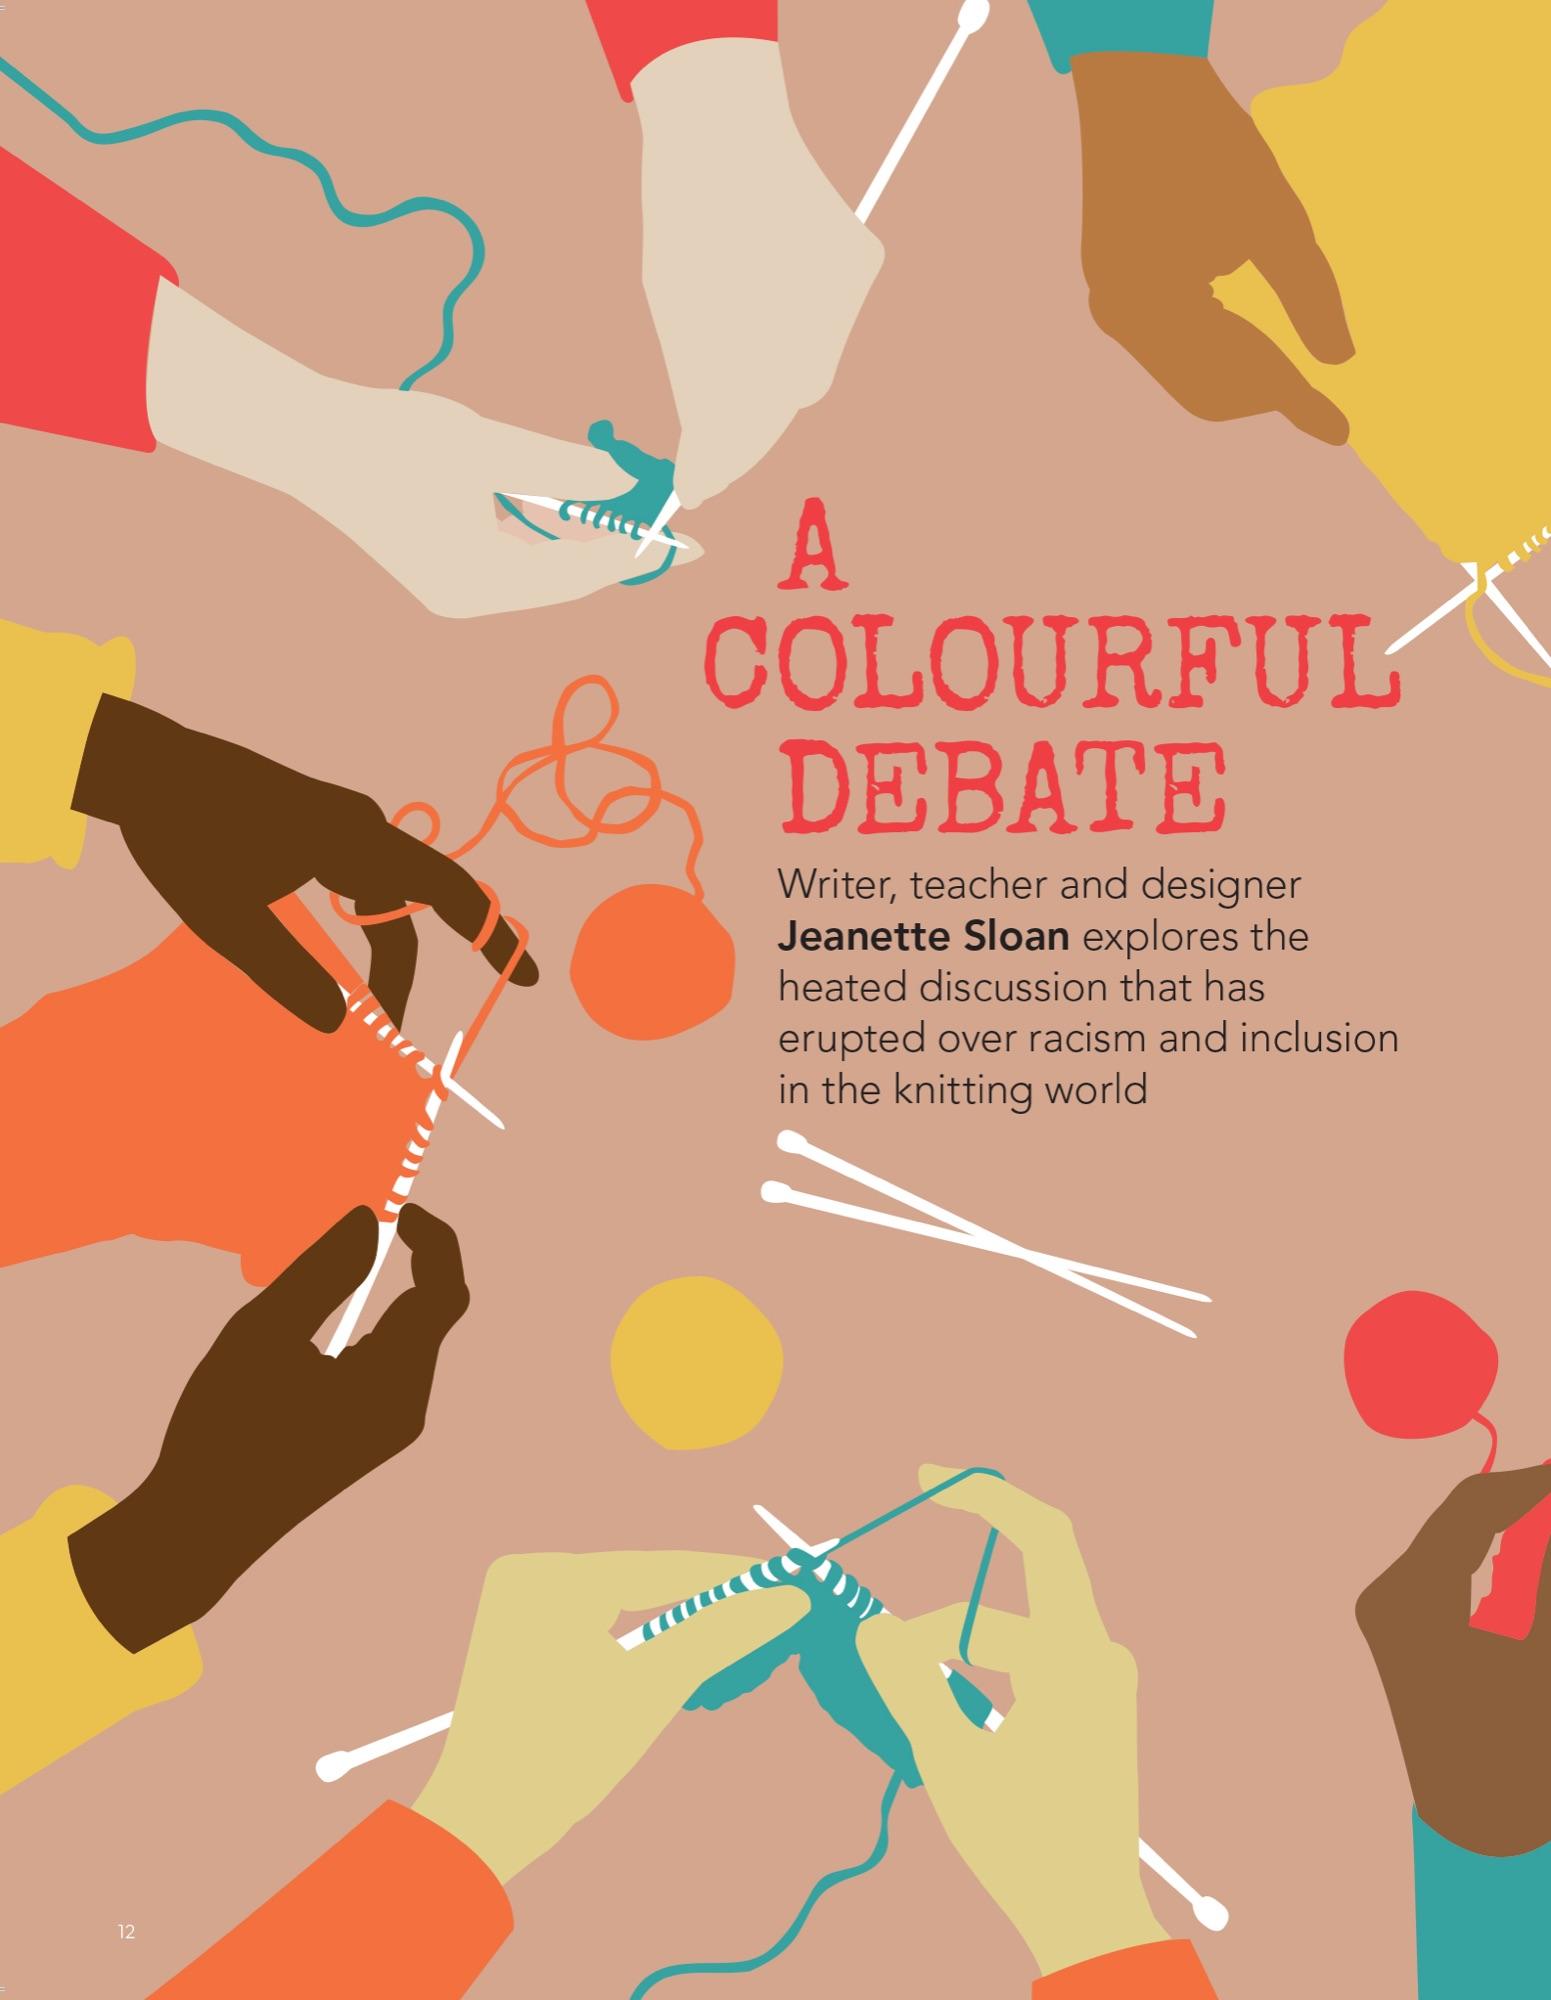 A Colourful Debate